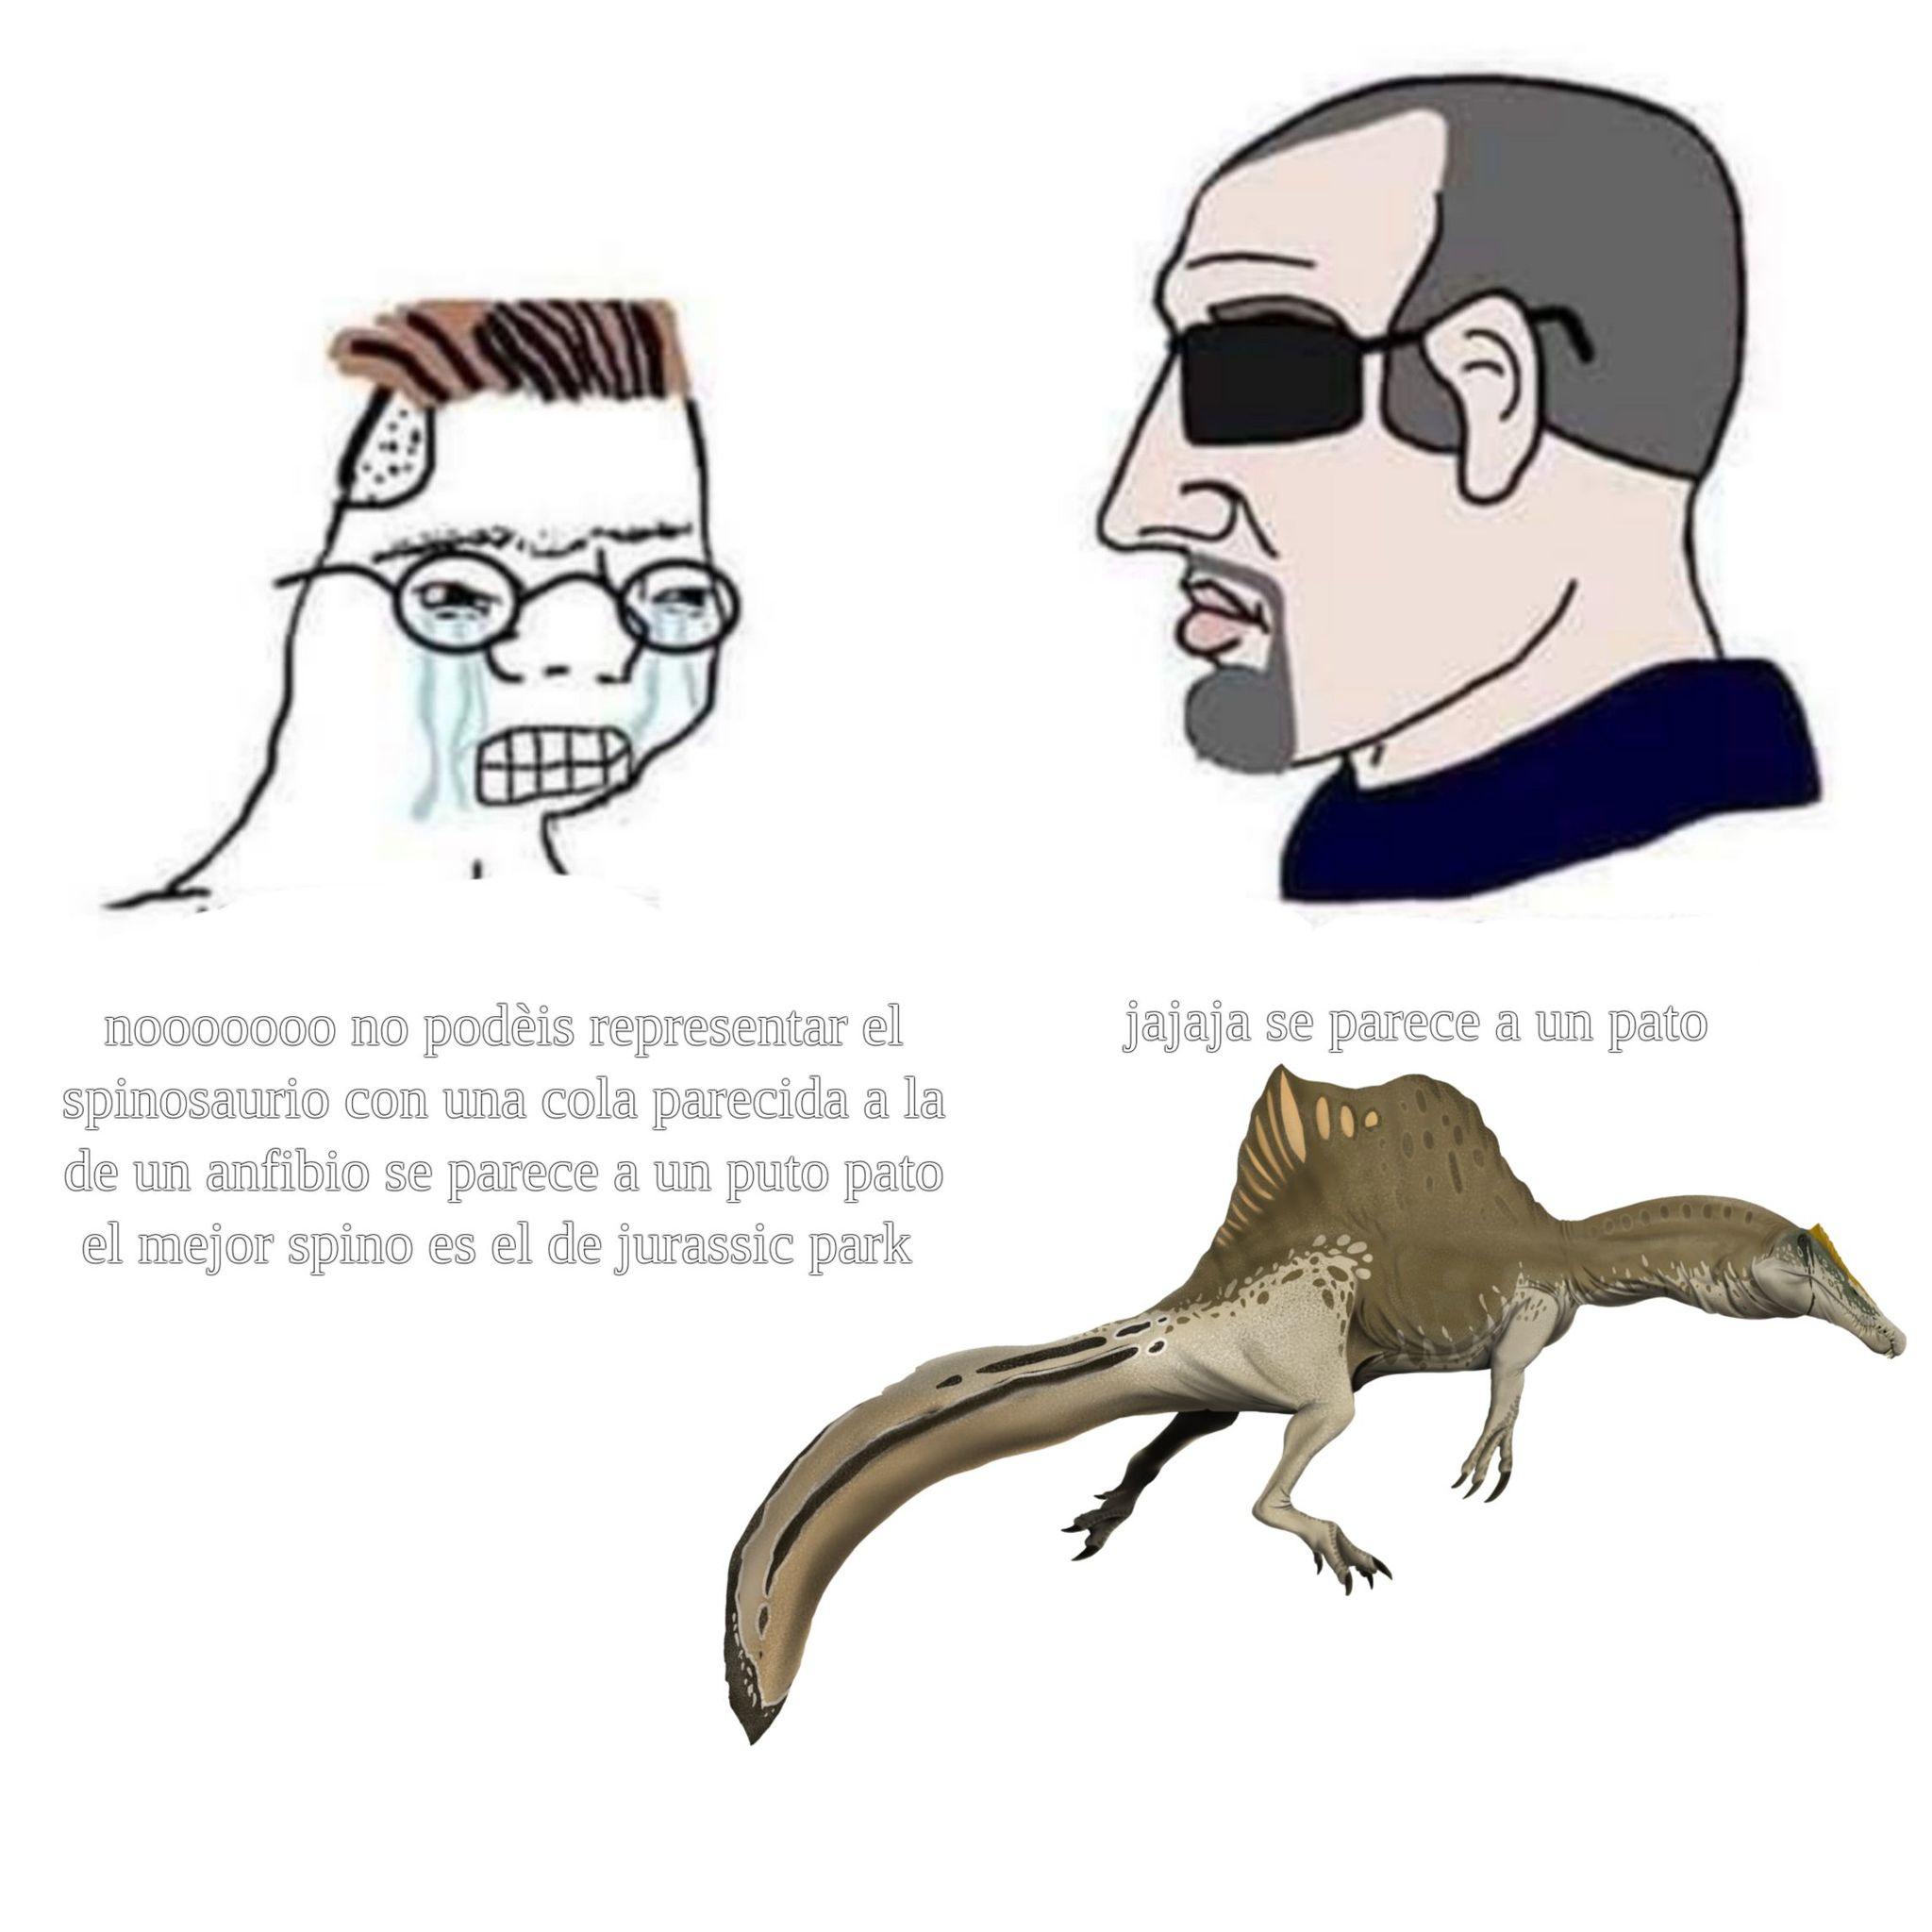 jurassic trolos - meme